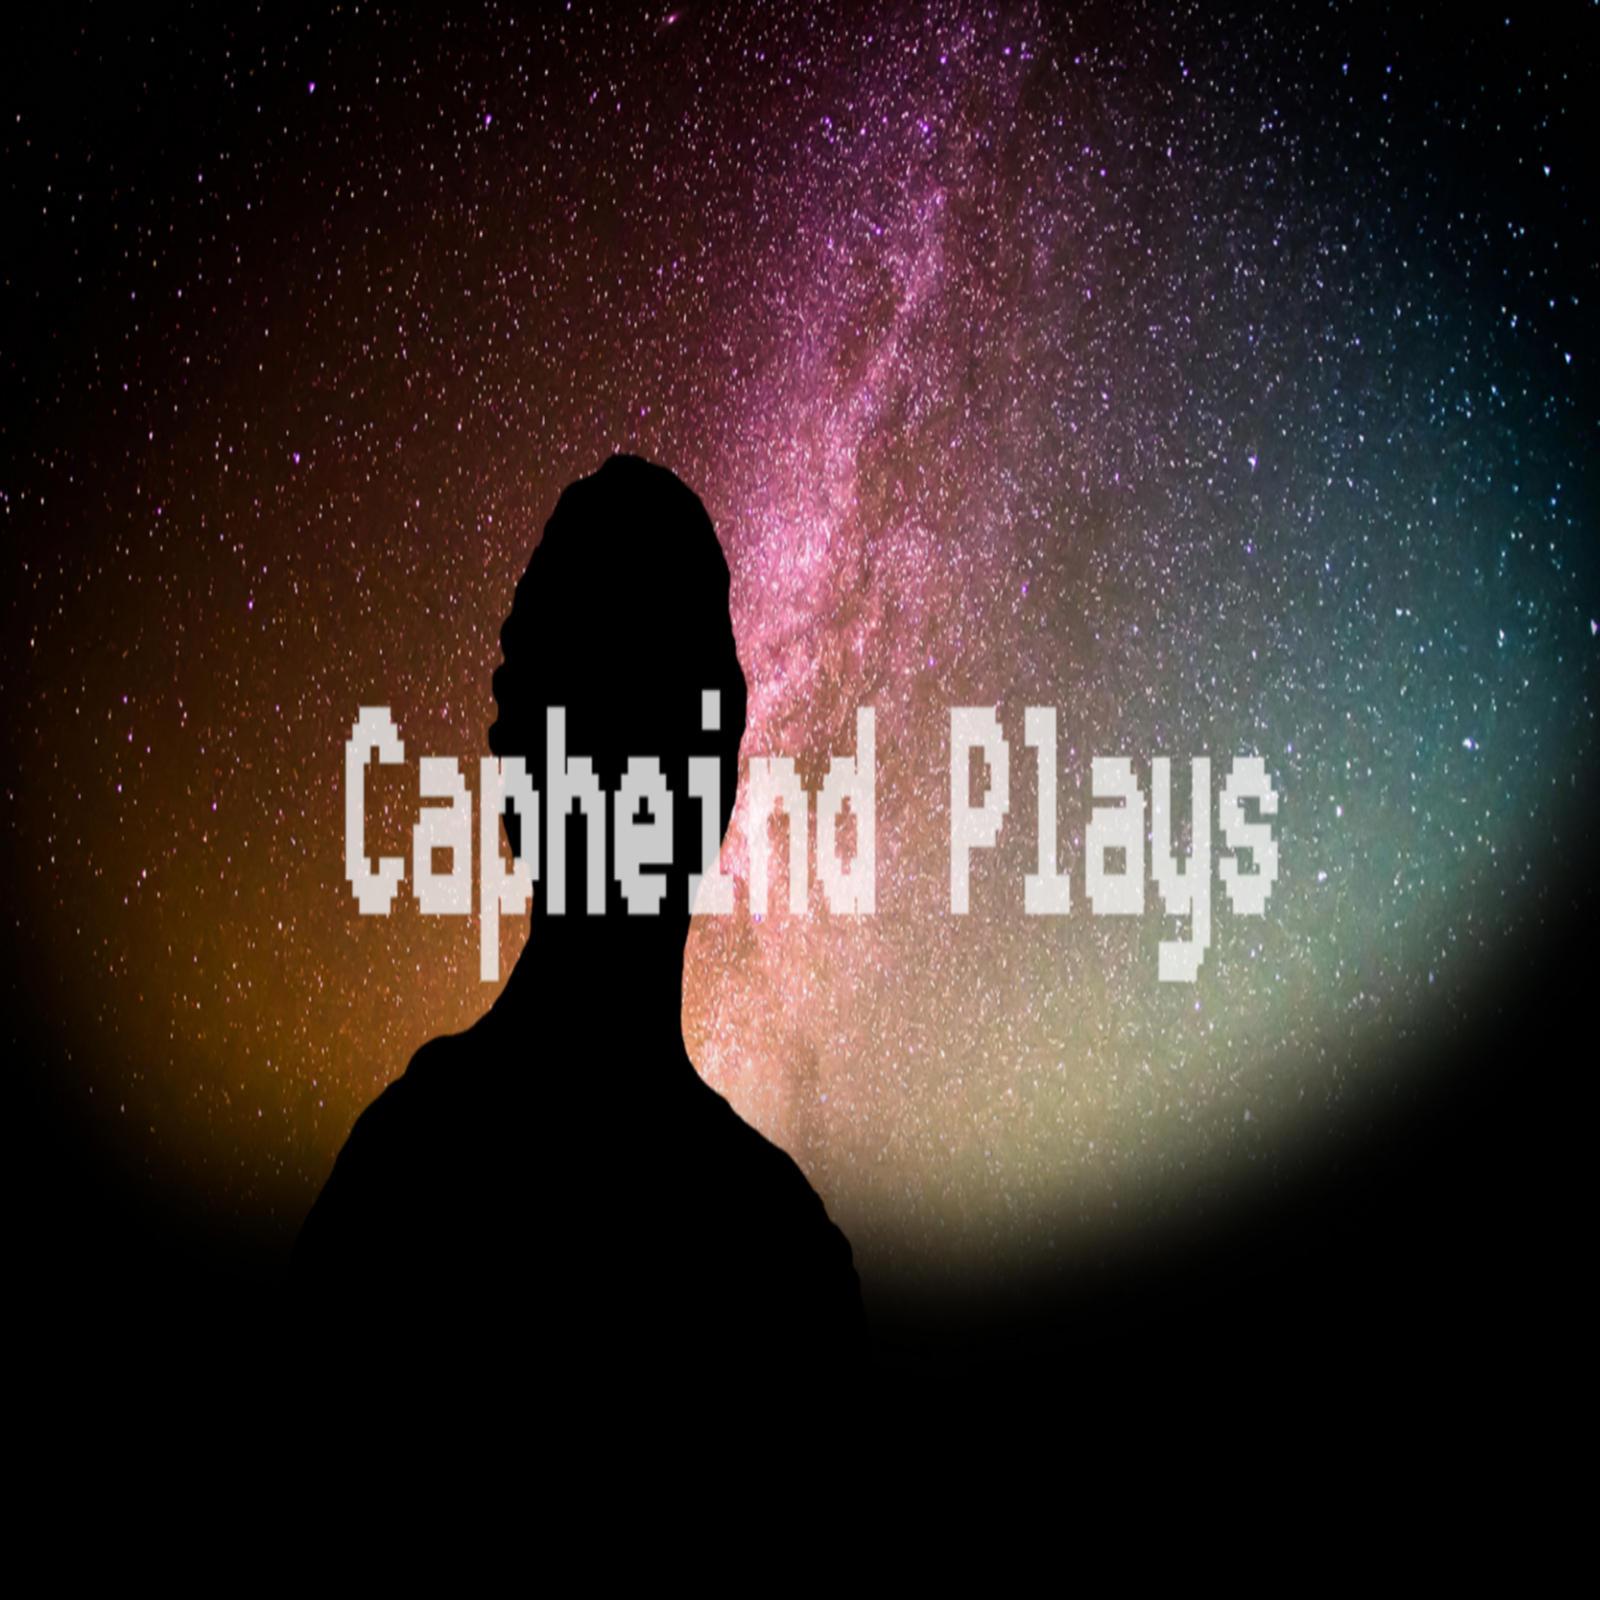 CapheindPlays Podcast Cover by capheind